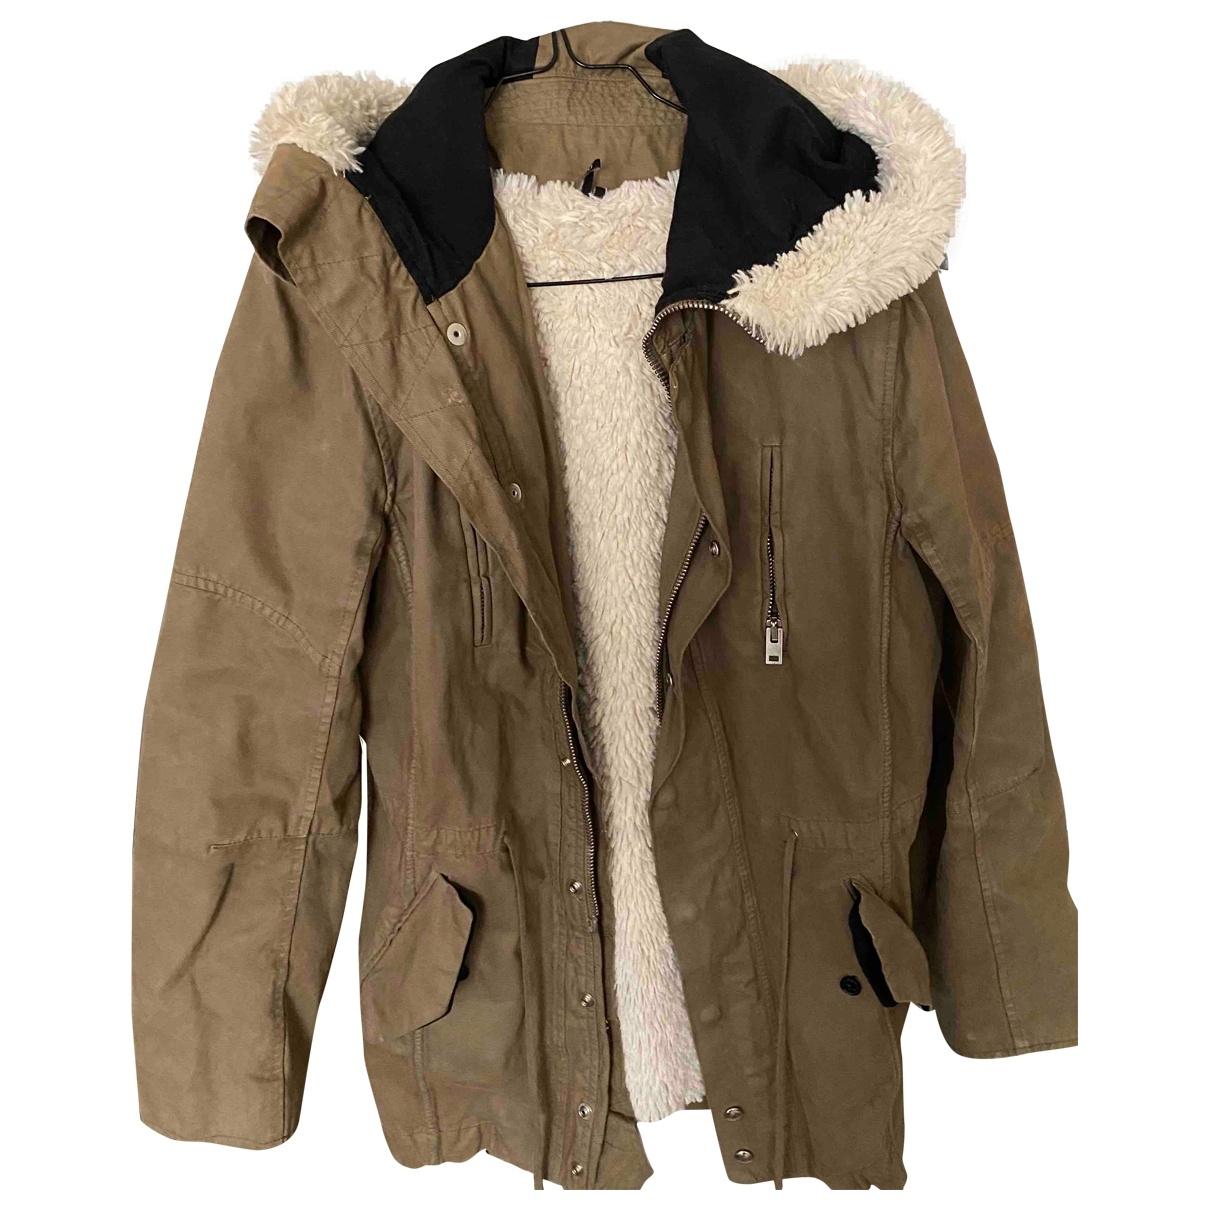 Iro \N Khaki coat for Women 36 FR